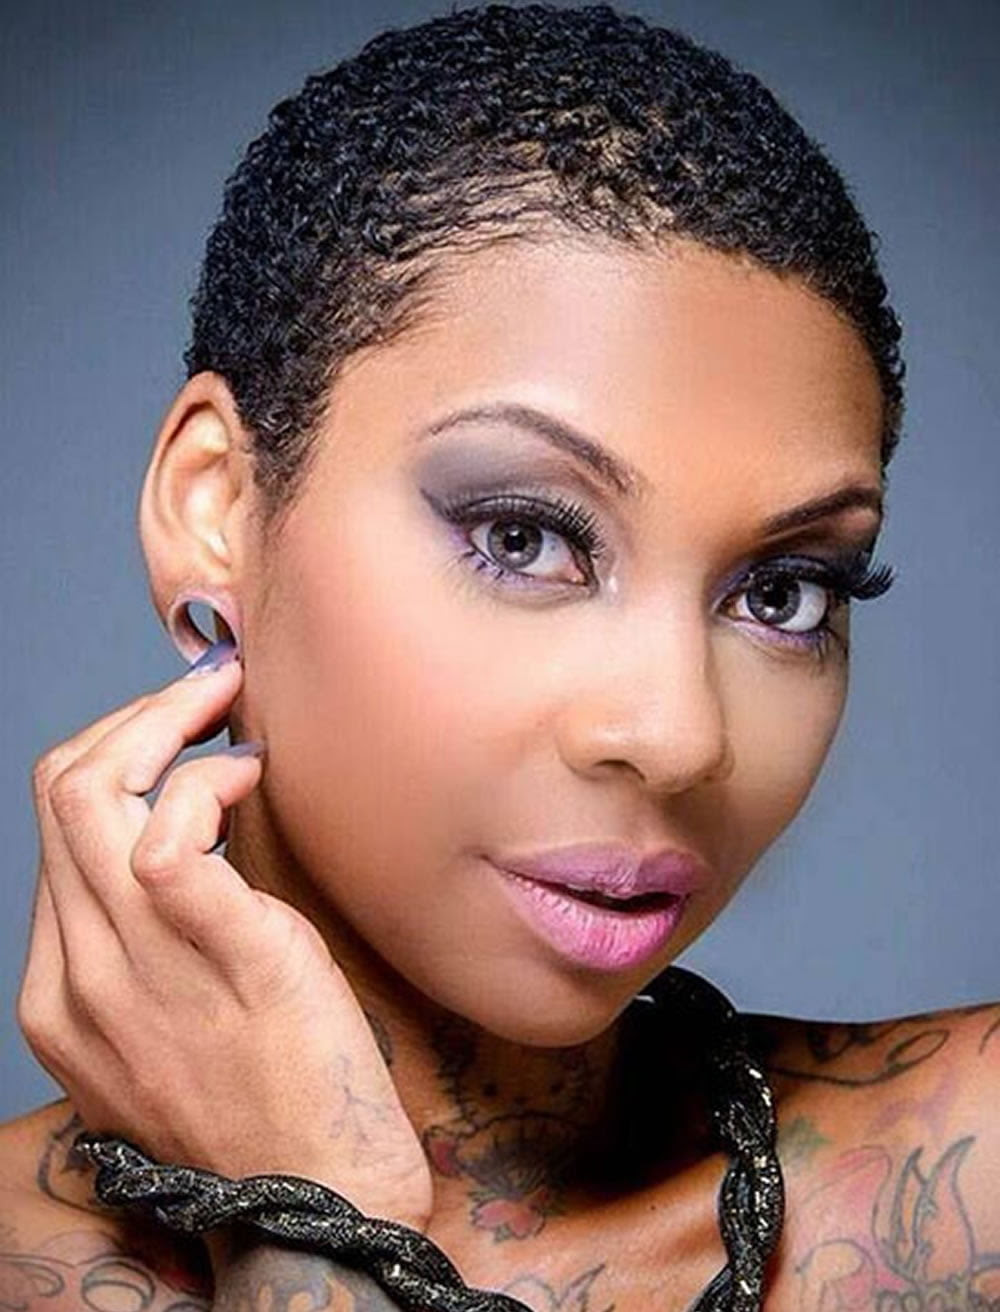 2018 Pixie Haircuts For Black Women - 26 Coolest Black ...